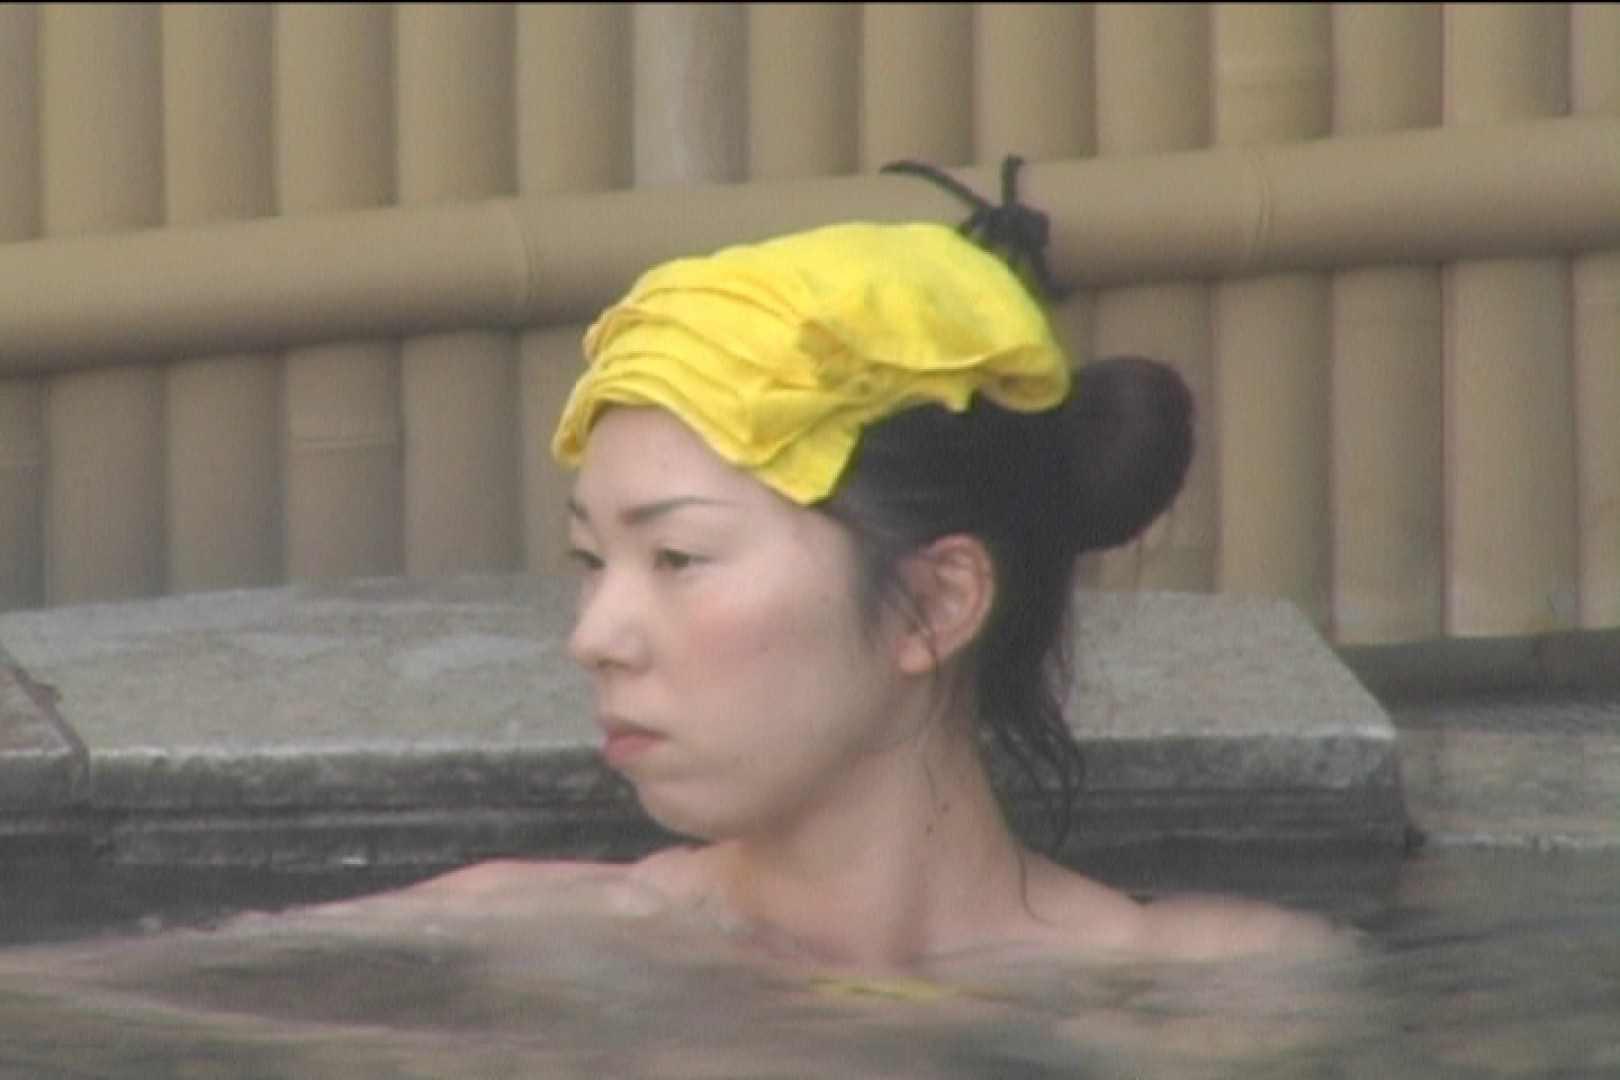 Aquaな露天風呂Vol.529 盗撮映像  51Pix 34